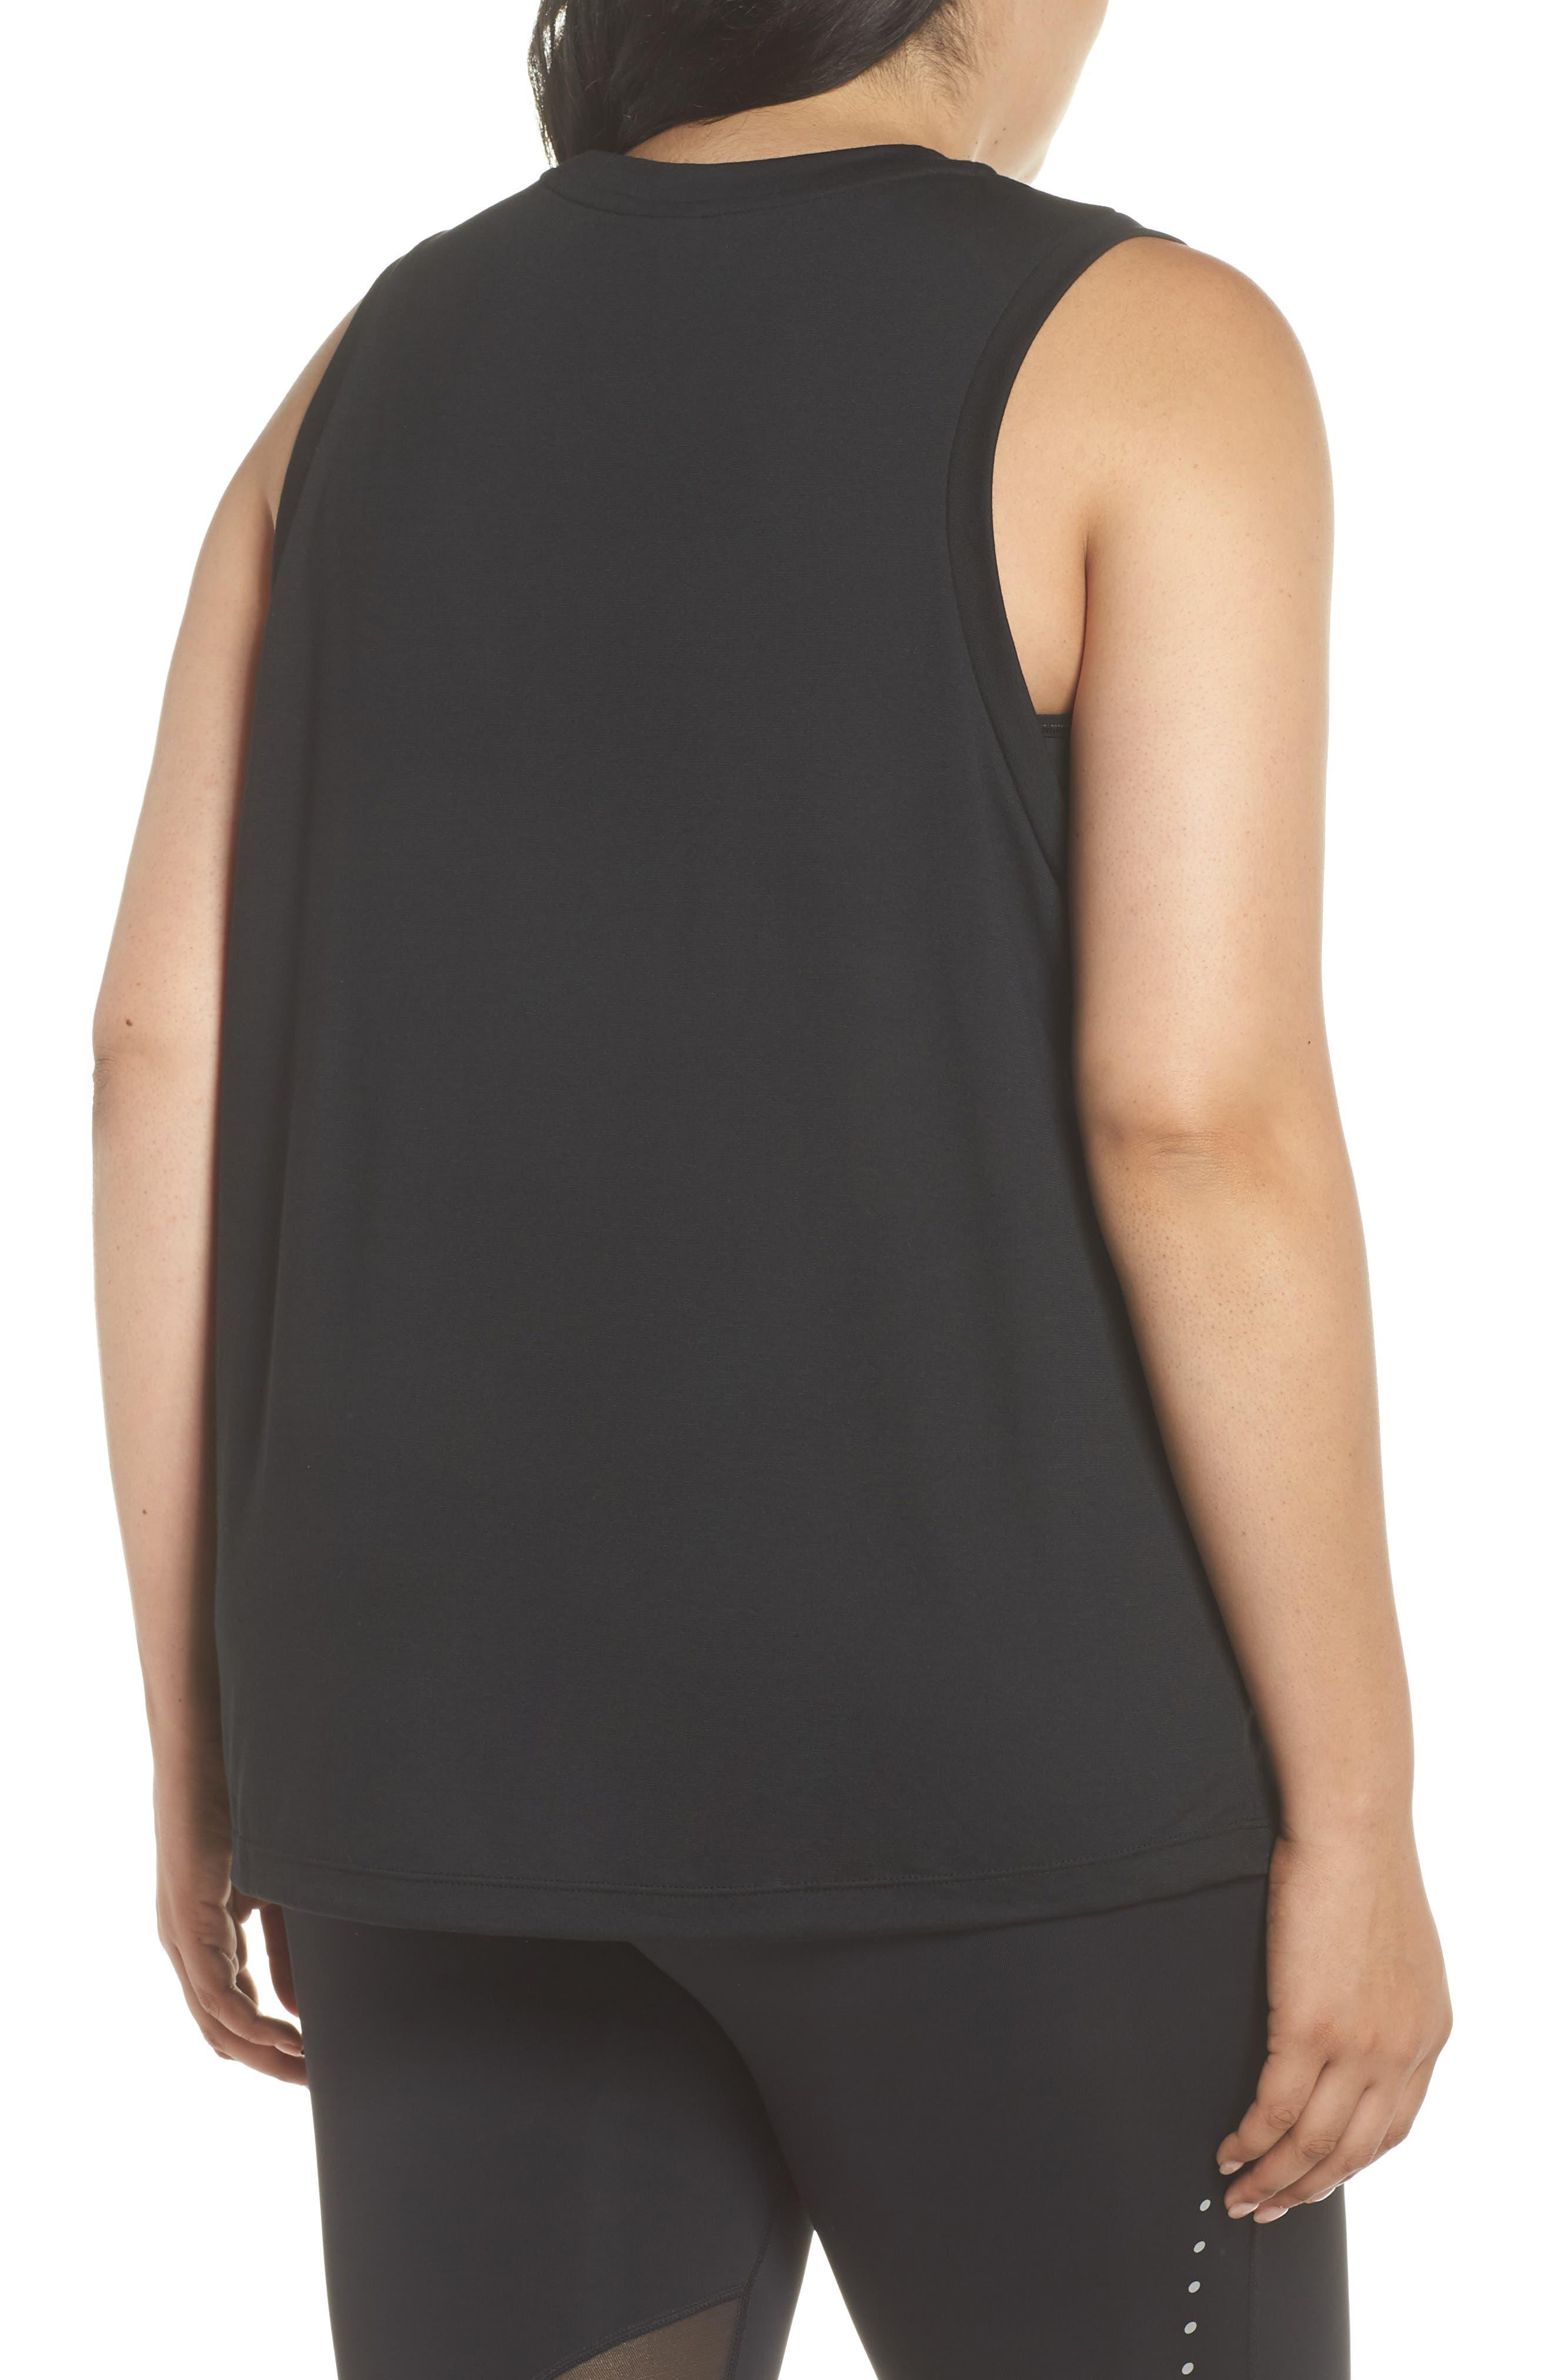 Sportswear Essential Muscle Tank,                             Alternate thumbnail 2, color,                             010